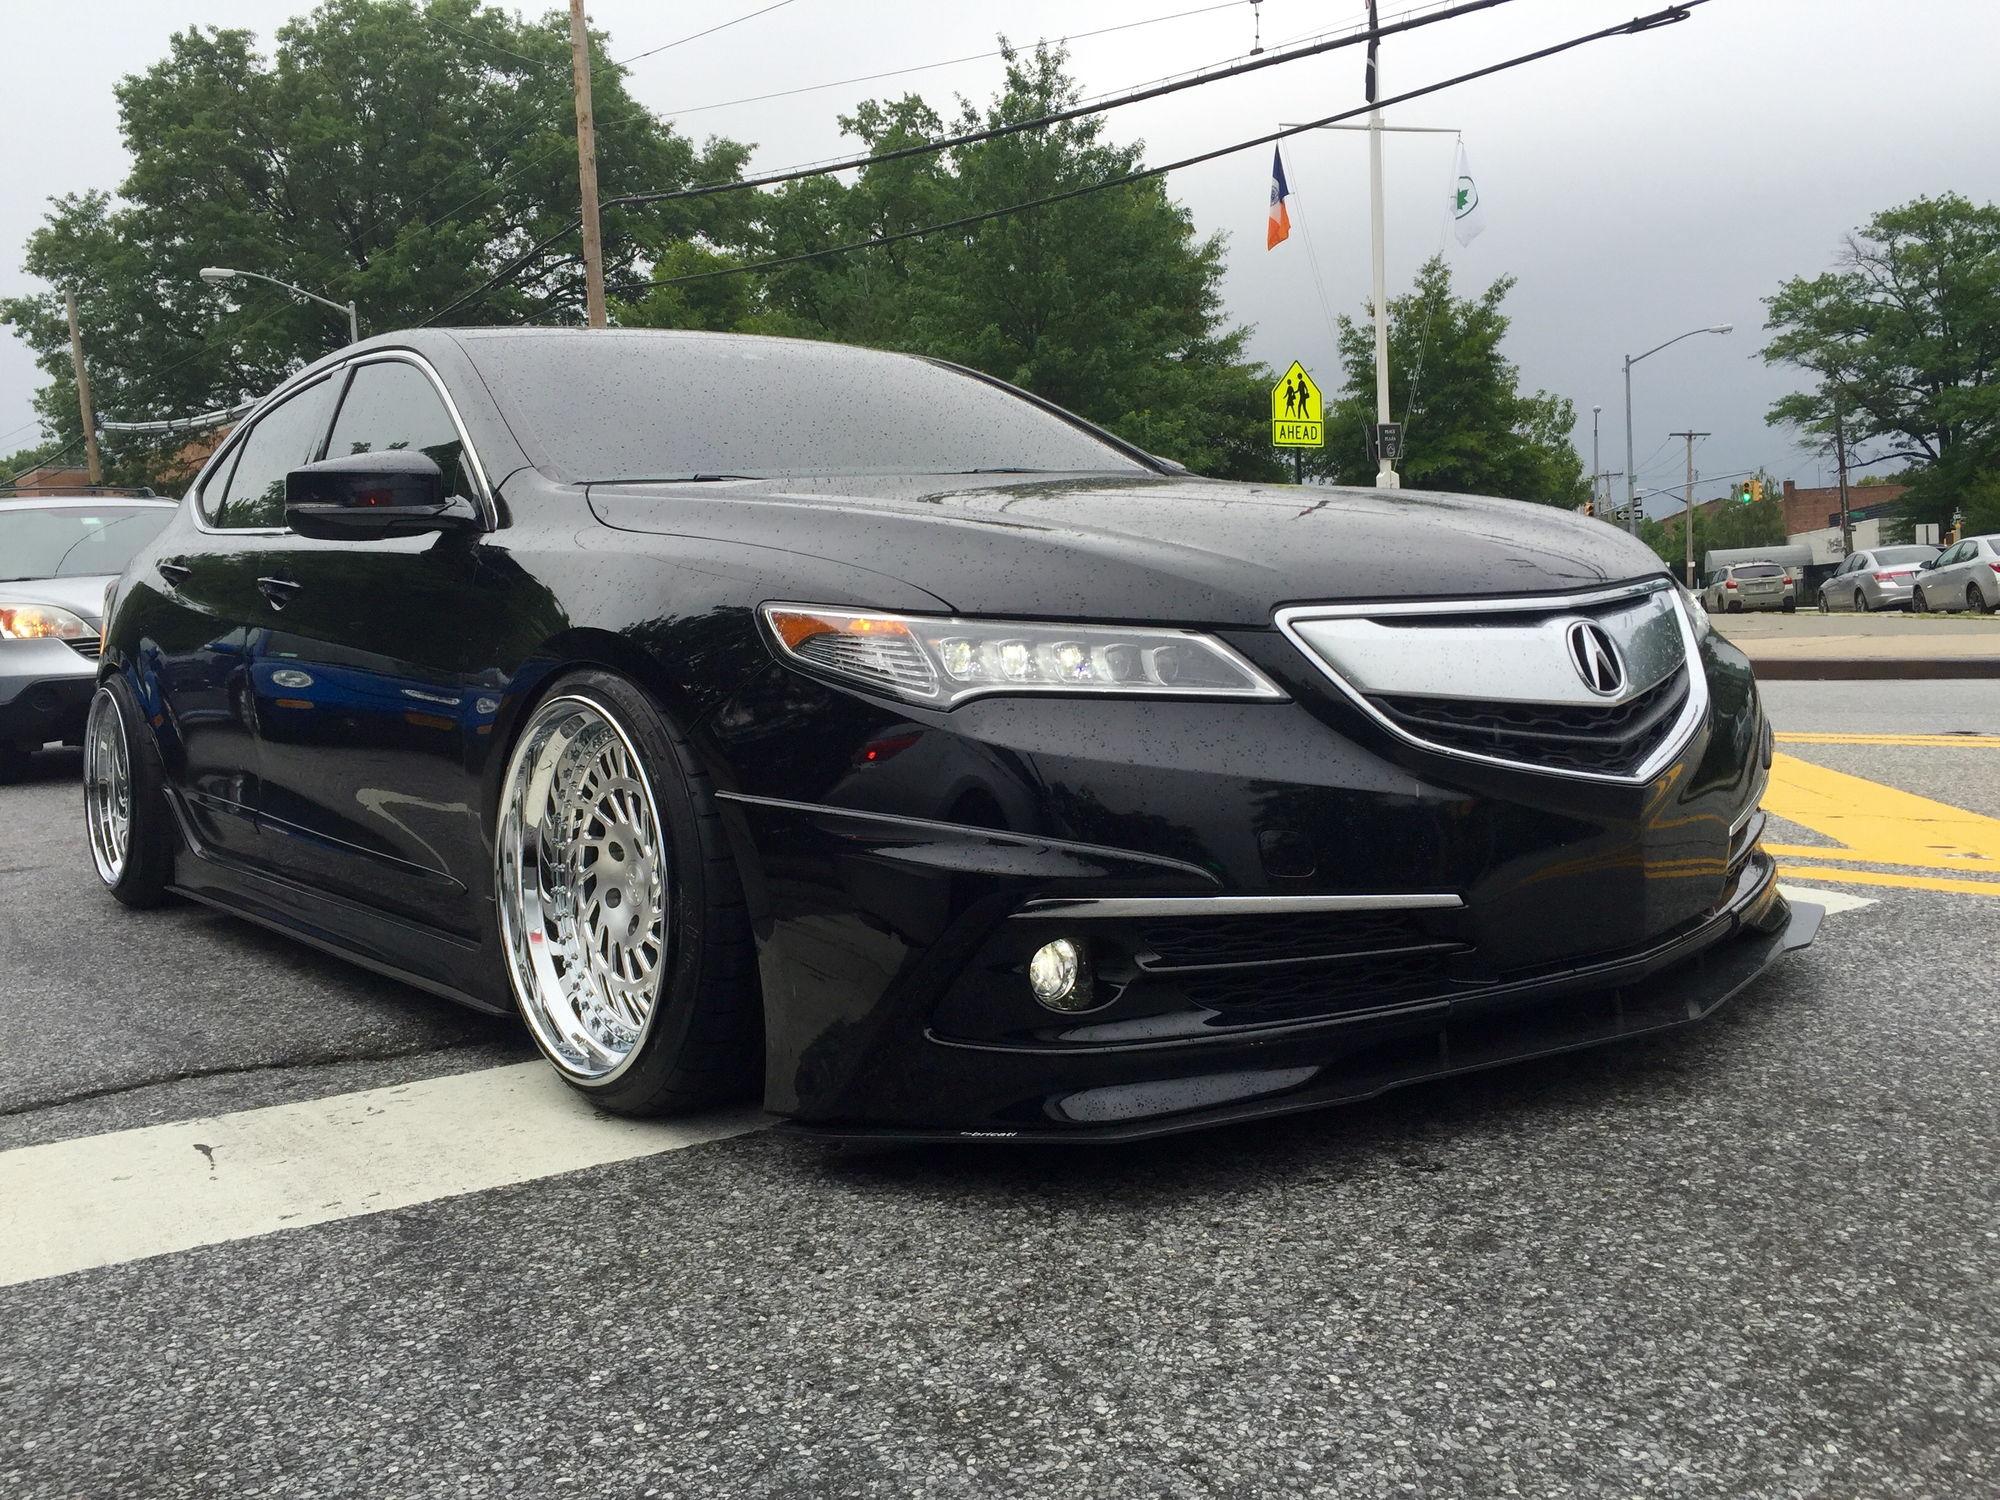 Marks 2015 V6 Sh AWD Tlx build - AcuraZine - Acura Enthusiast Community